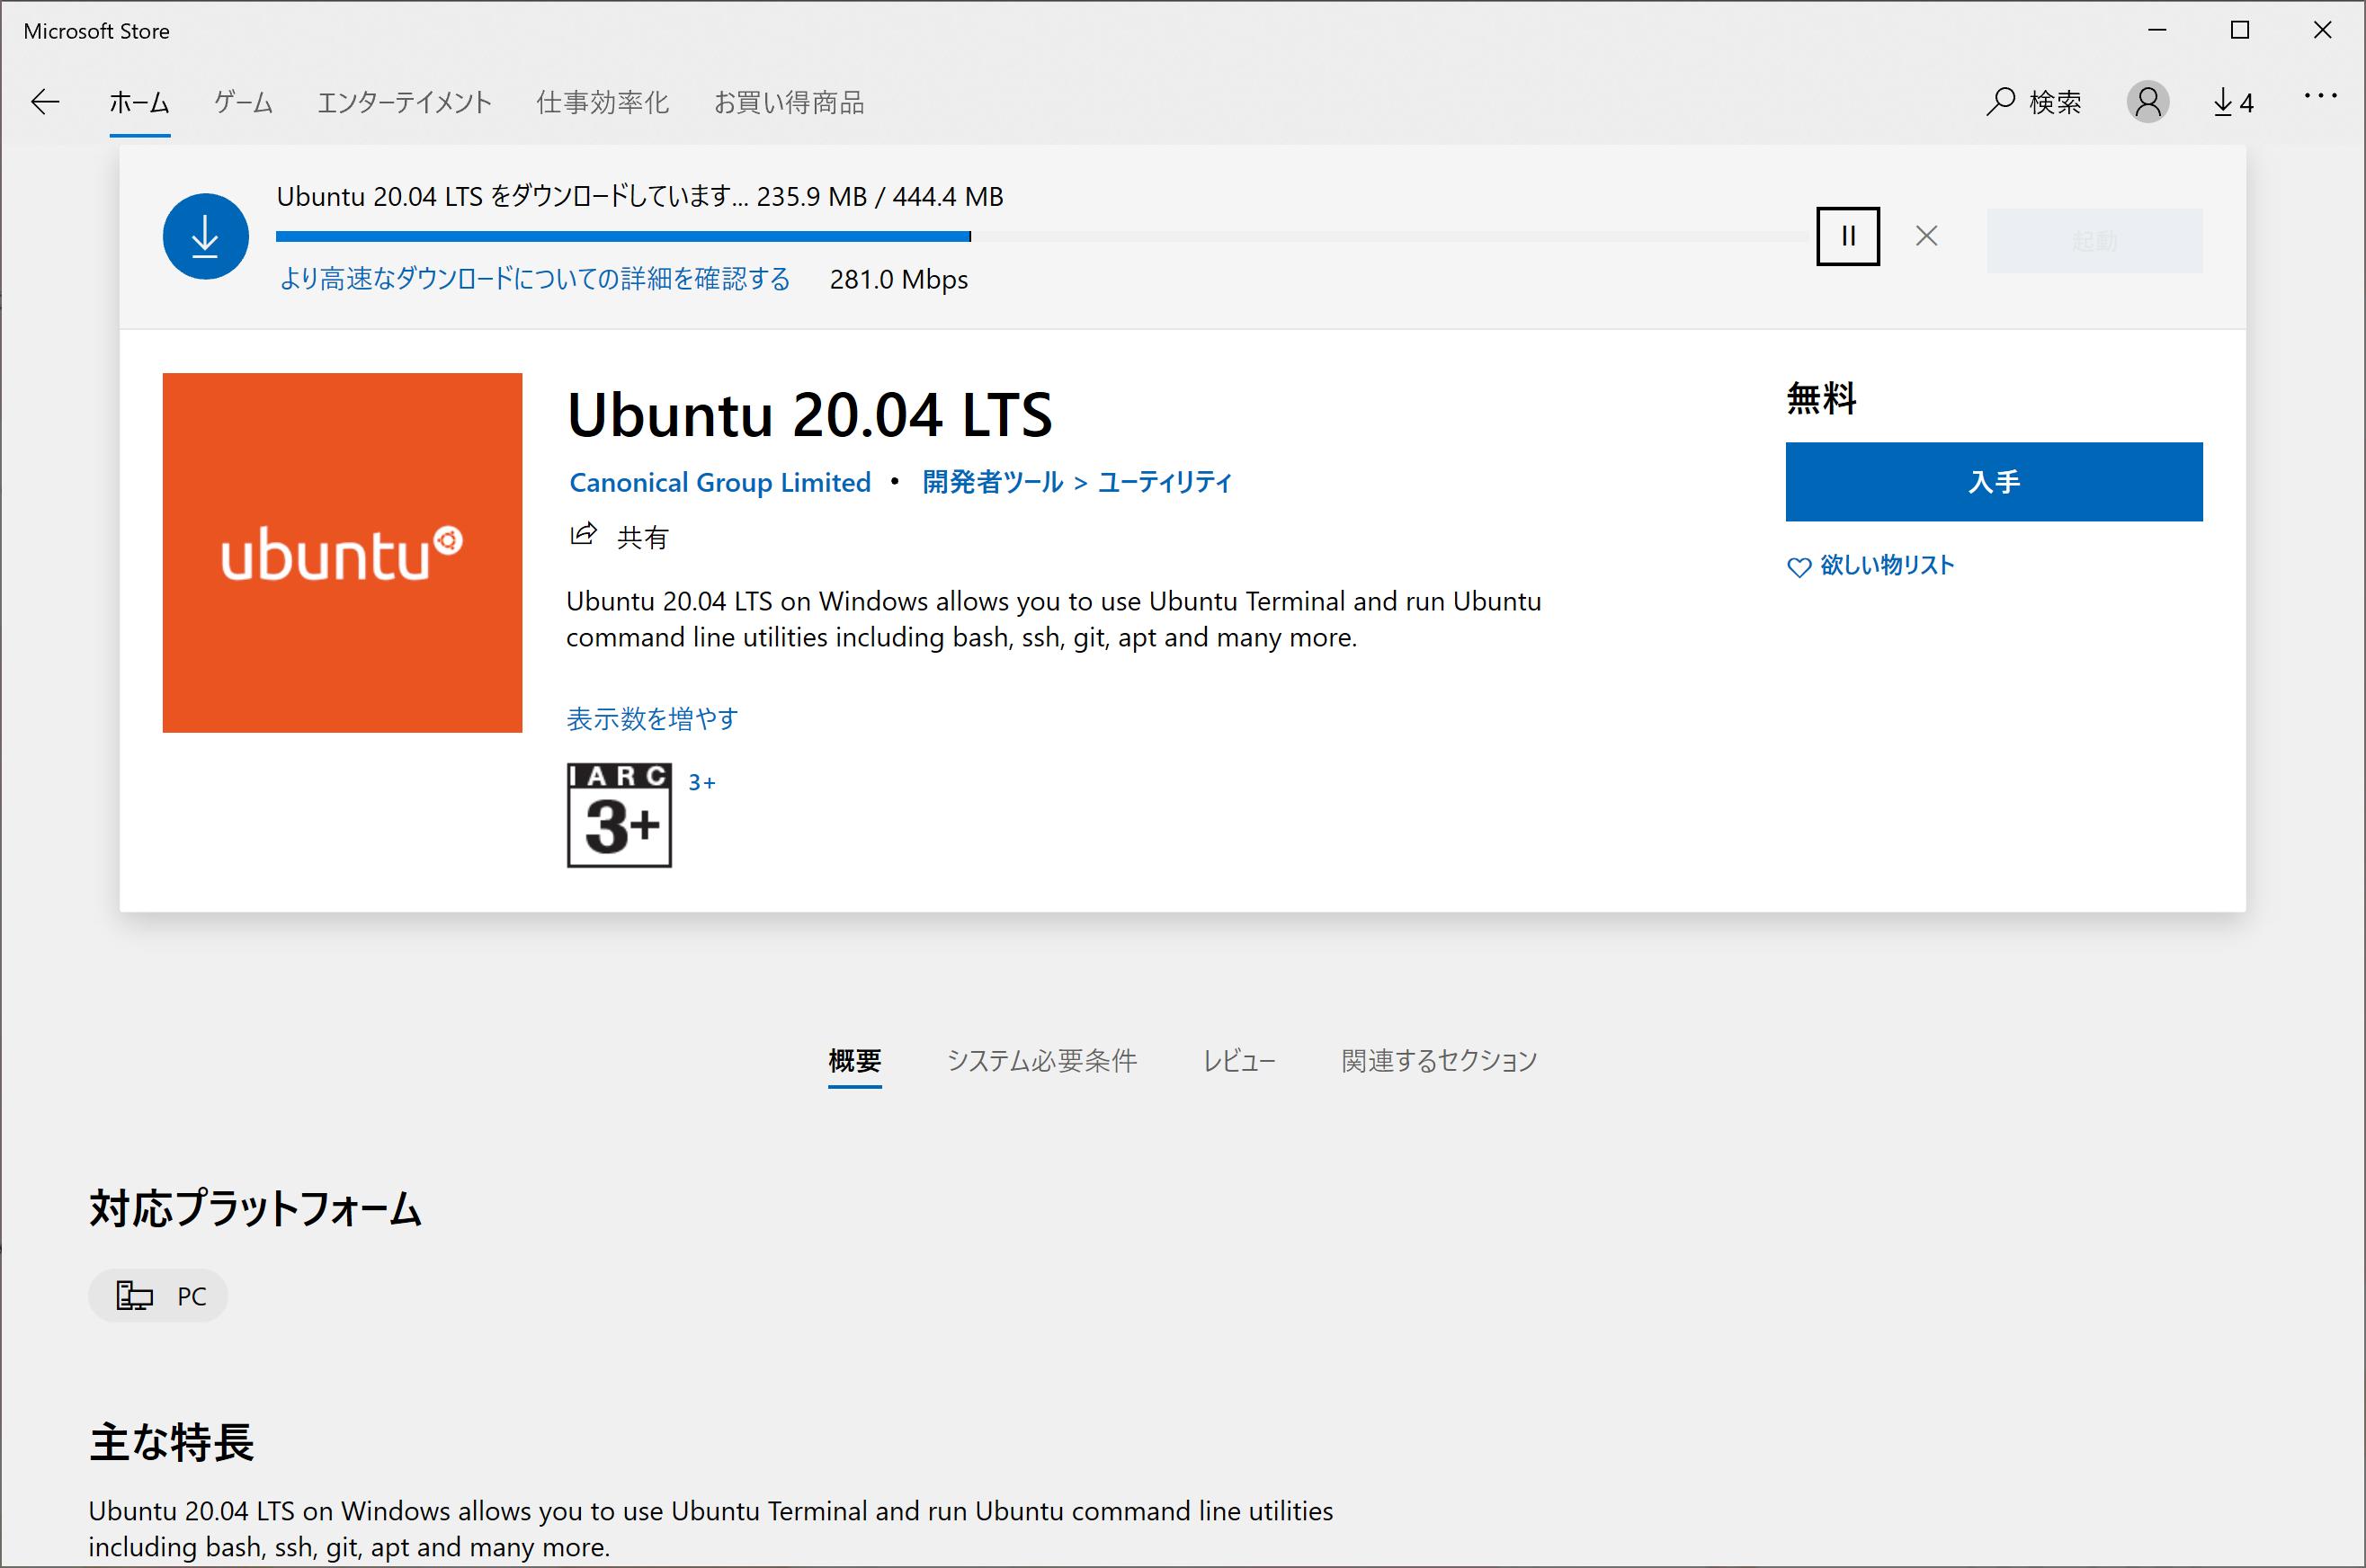 Microsoft Storeの「Ubuntu 20.04 LTS」のインストール中の画面